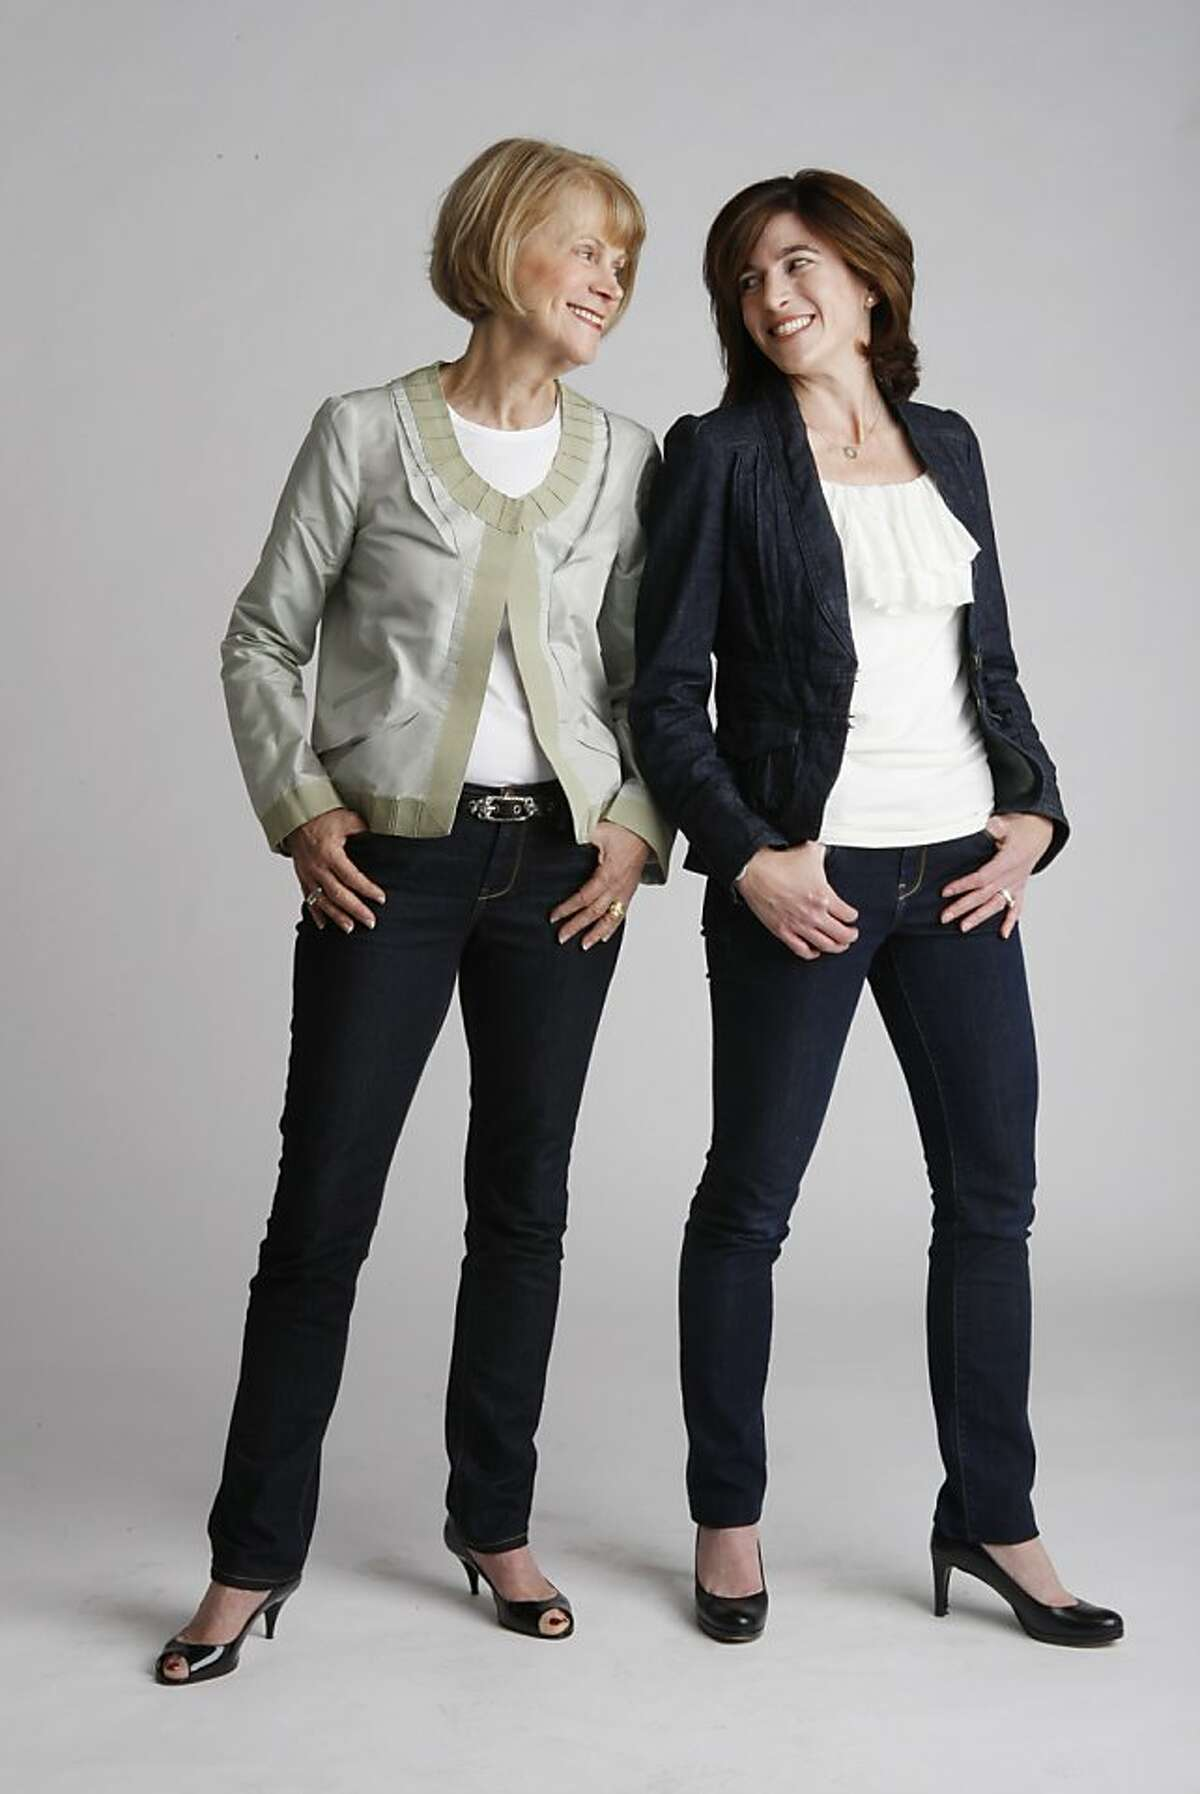 Diane Einstein and Carolyn Einstein Dewar pose for the Style Maker feature in studio on Thursday, April 28, 2011.